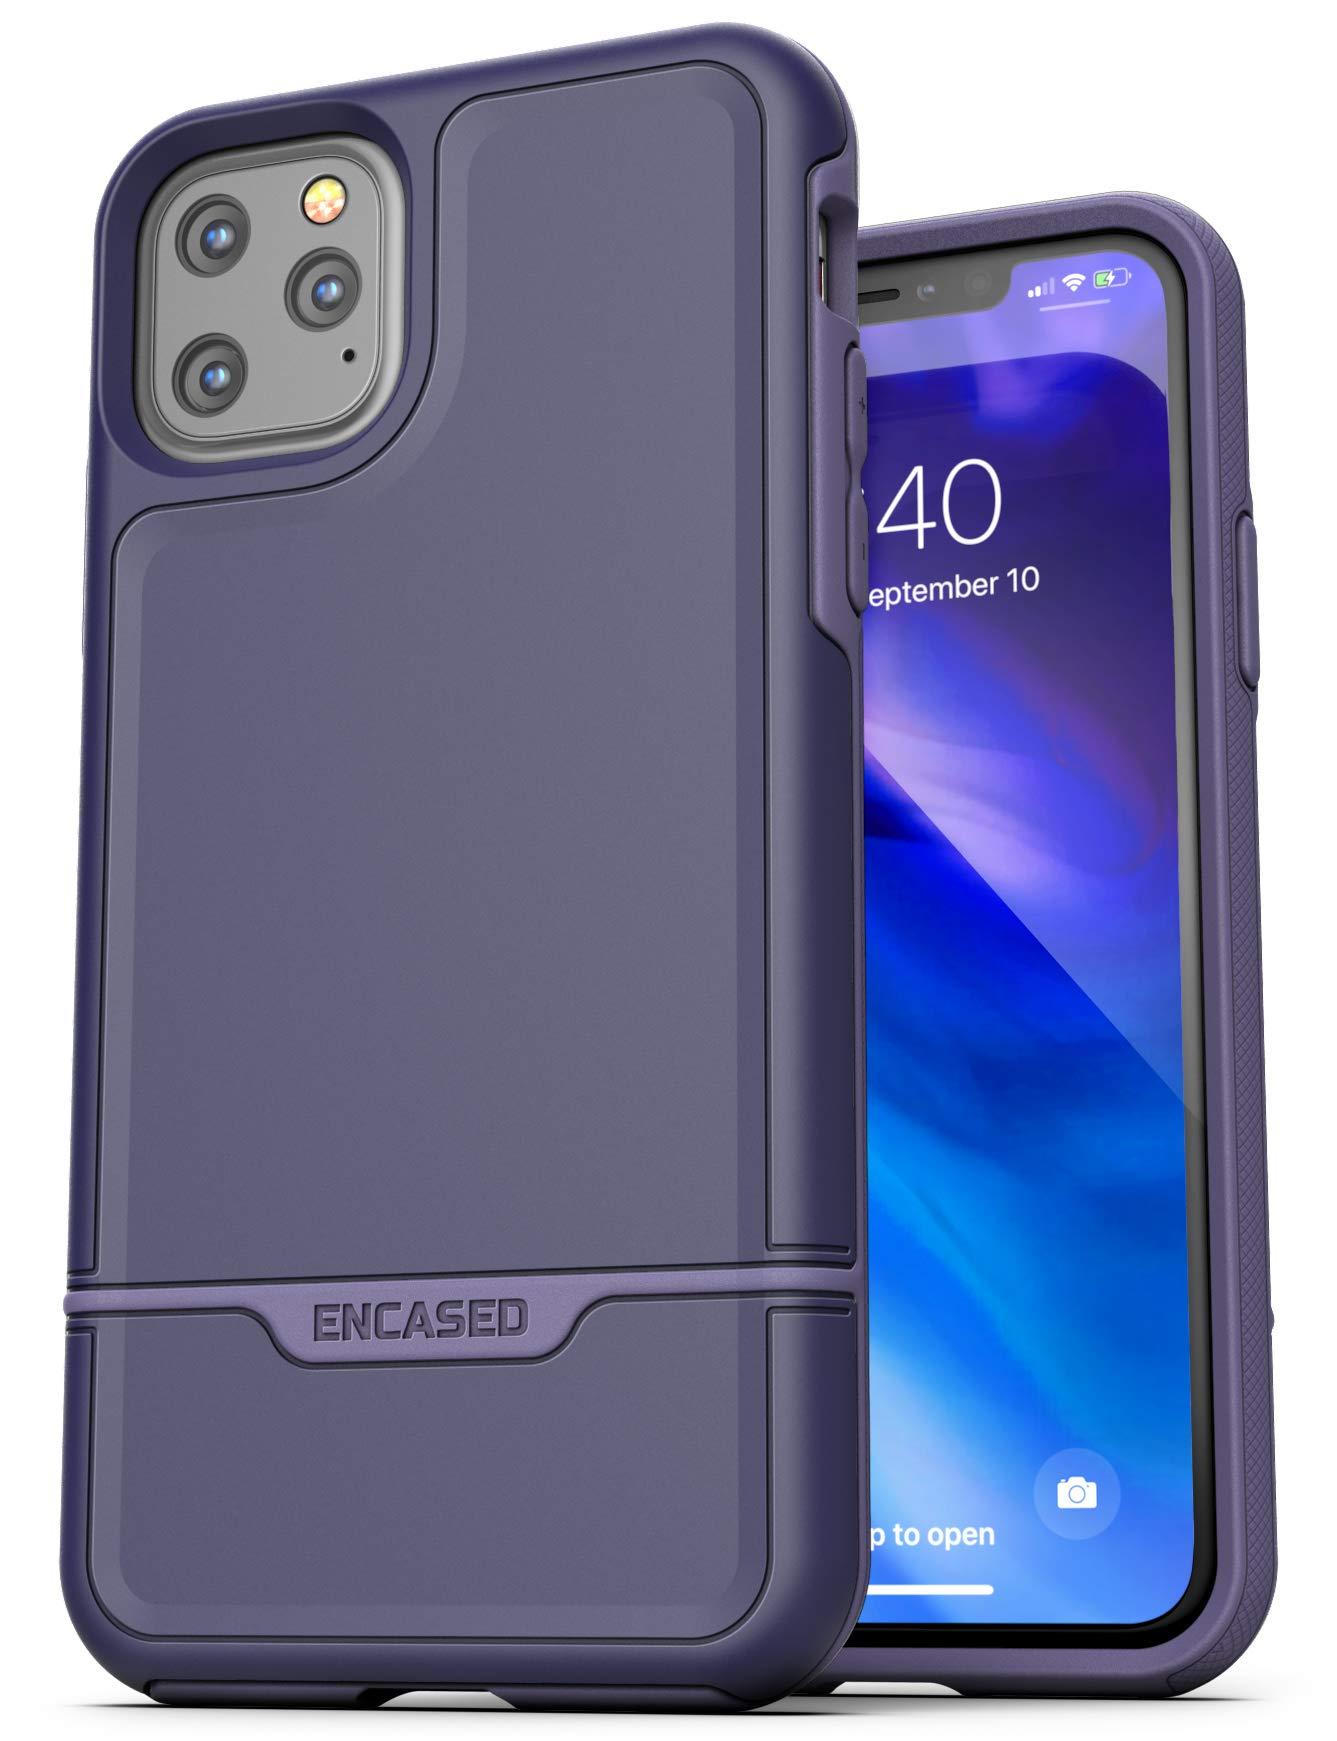 Encased Protective iPhone 11 Pro Case Purple (2019 Rebel Armor) Military Grade Heavy Duty Full Body Cover